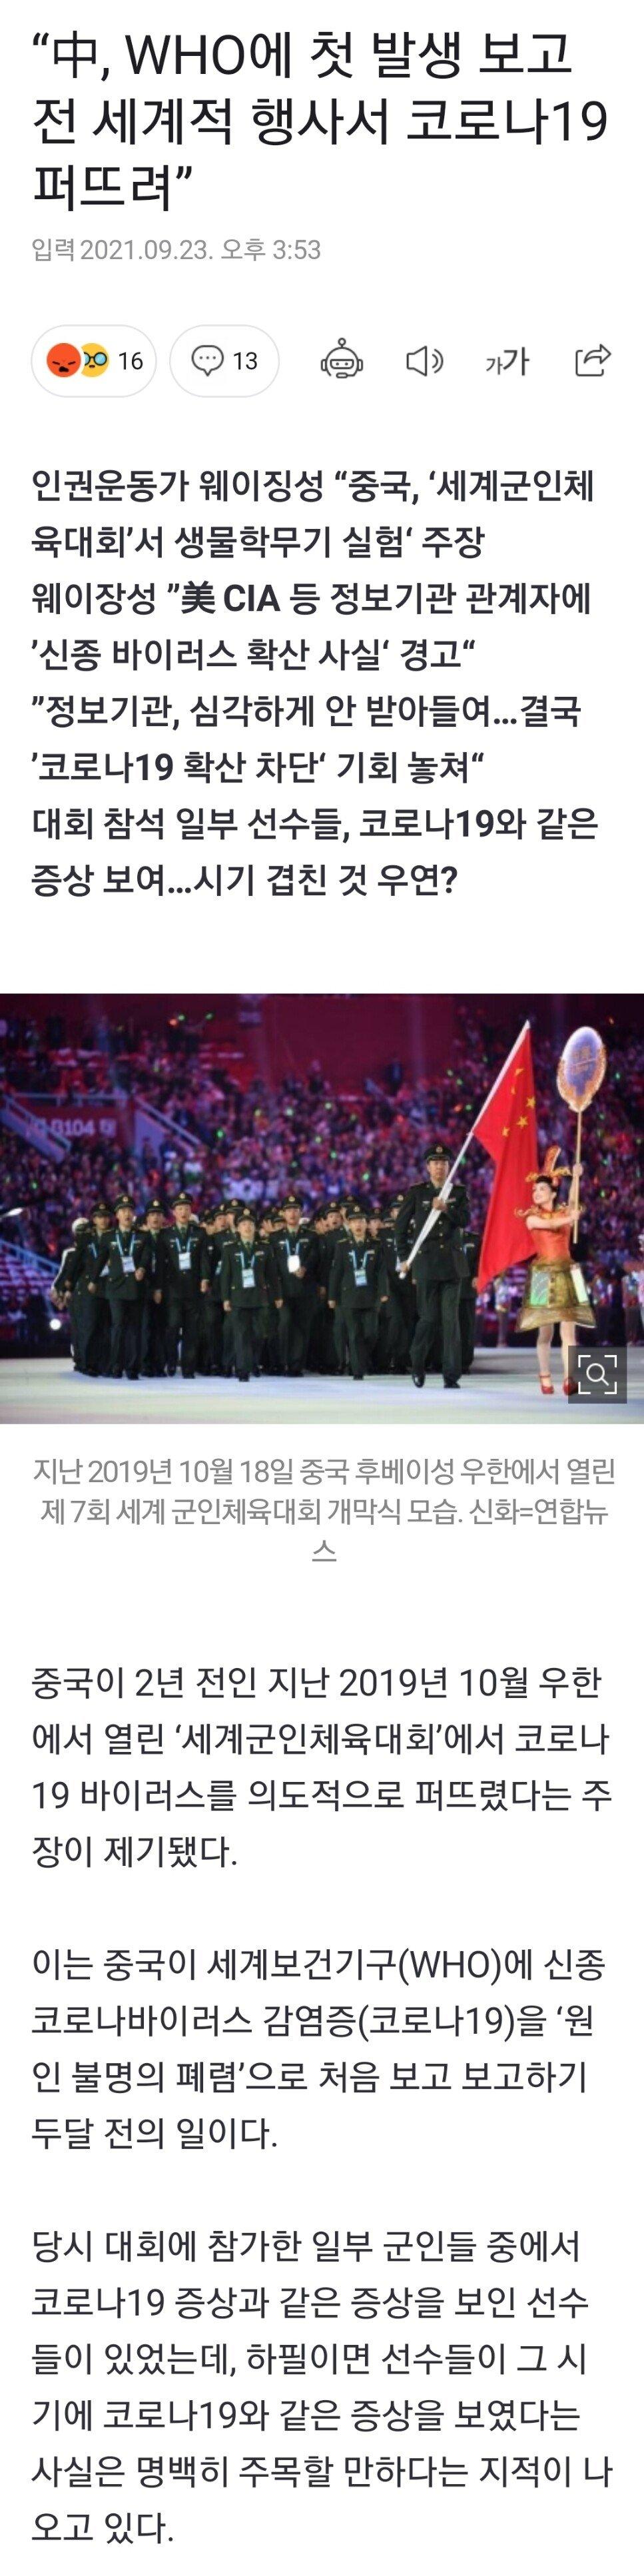 Screenshot_20210923-203413_Samsung Internet.jpg 중국 우한연구소에서 고의로 코로나 바이러스 전파 의혹.jpg